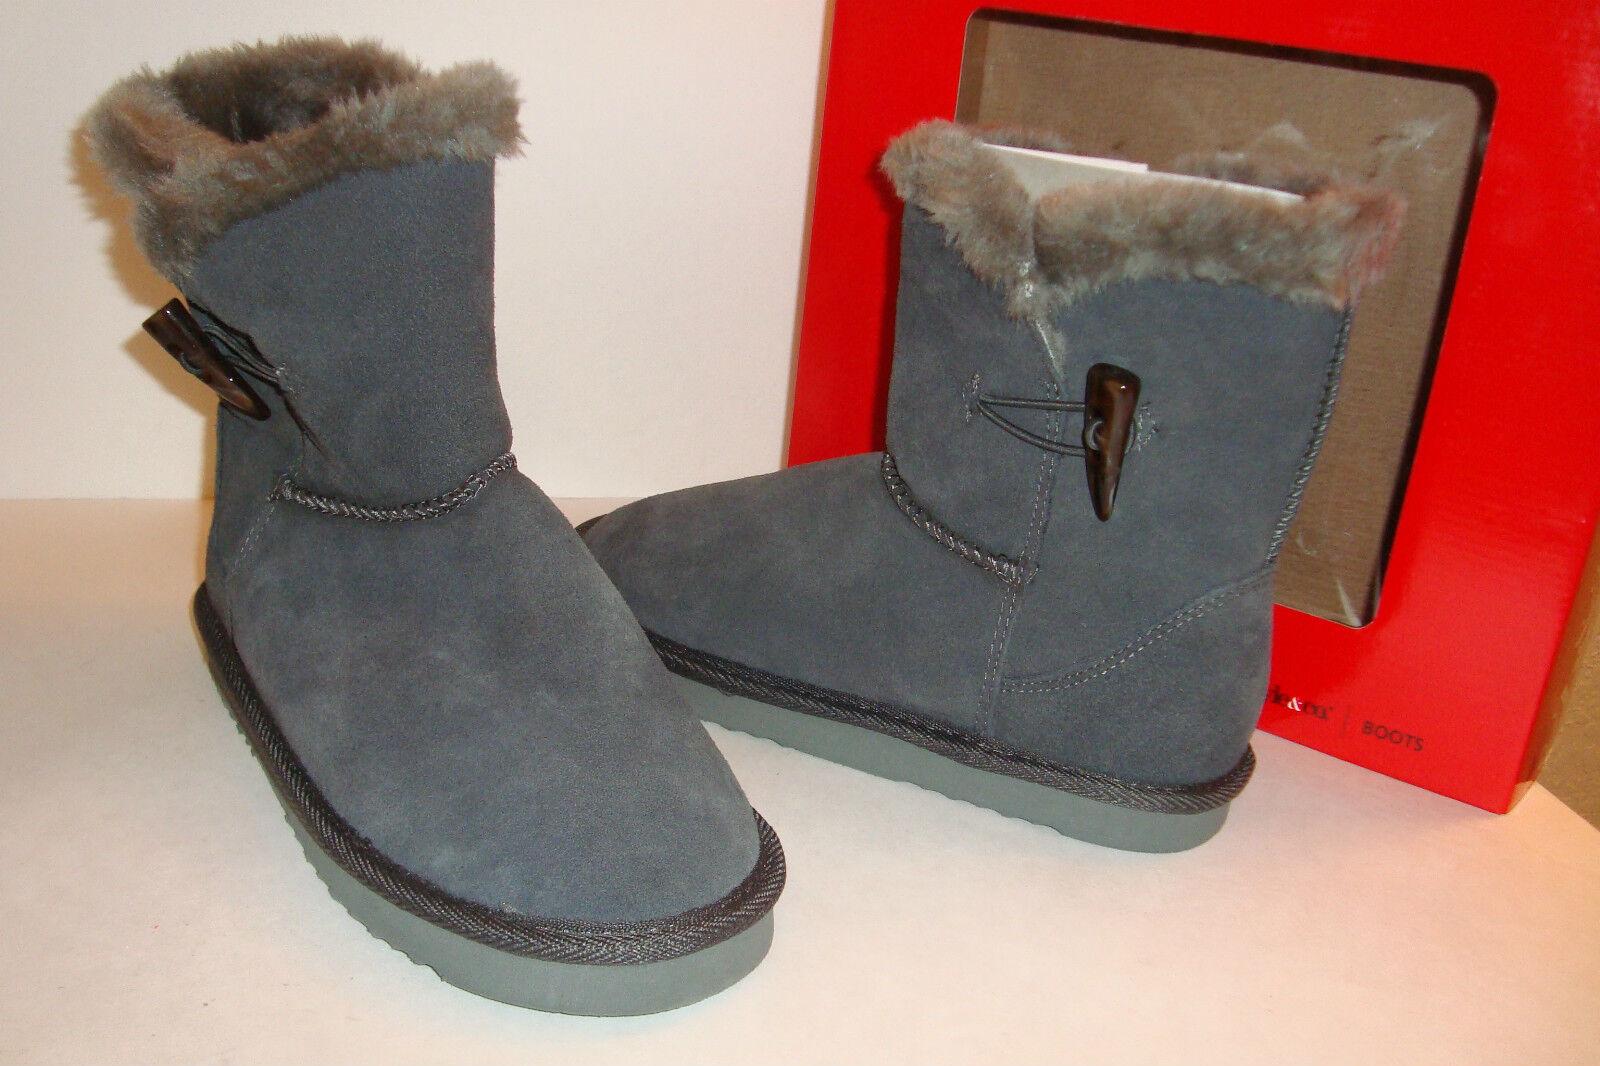 Style & Co Damenschuhe NWB Tiny Leder Grau Stiefel Schuhes 10 MED NEU